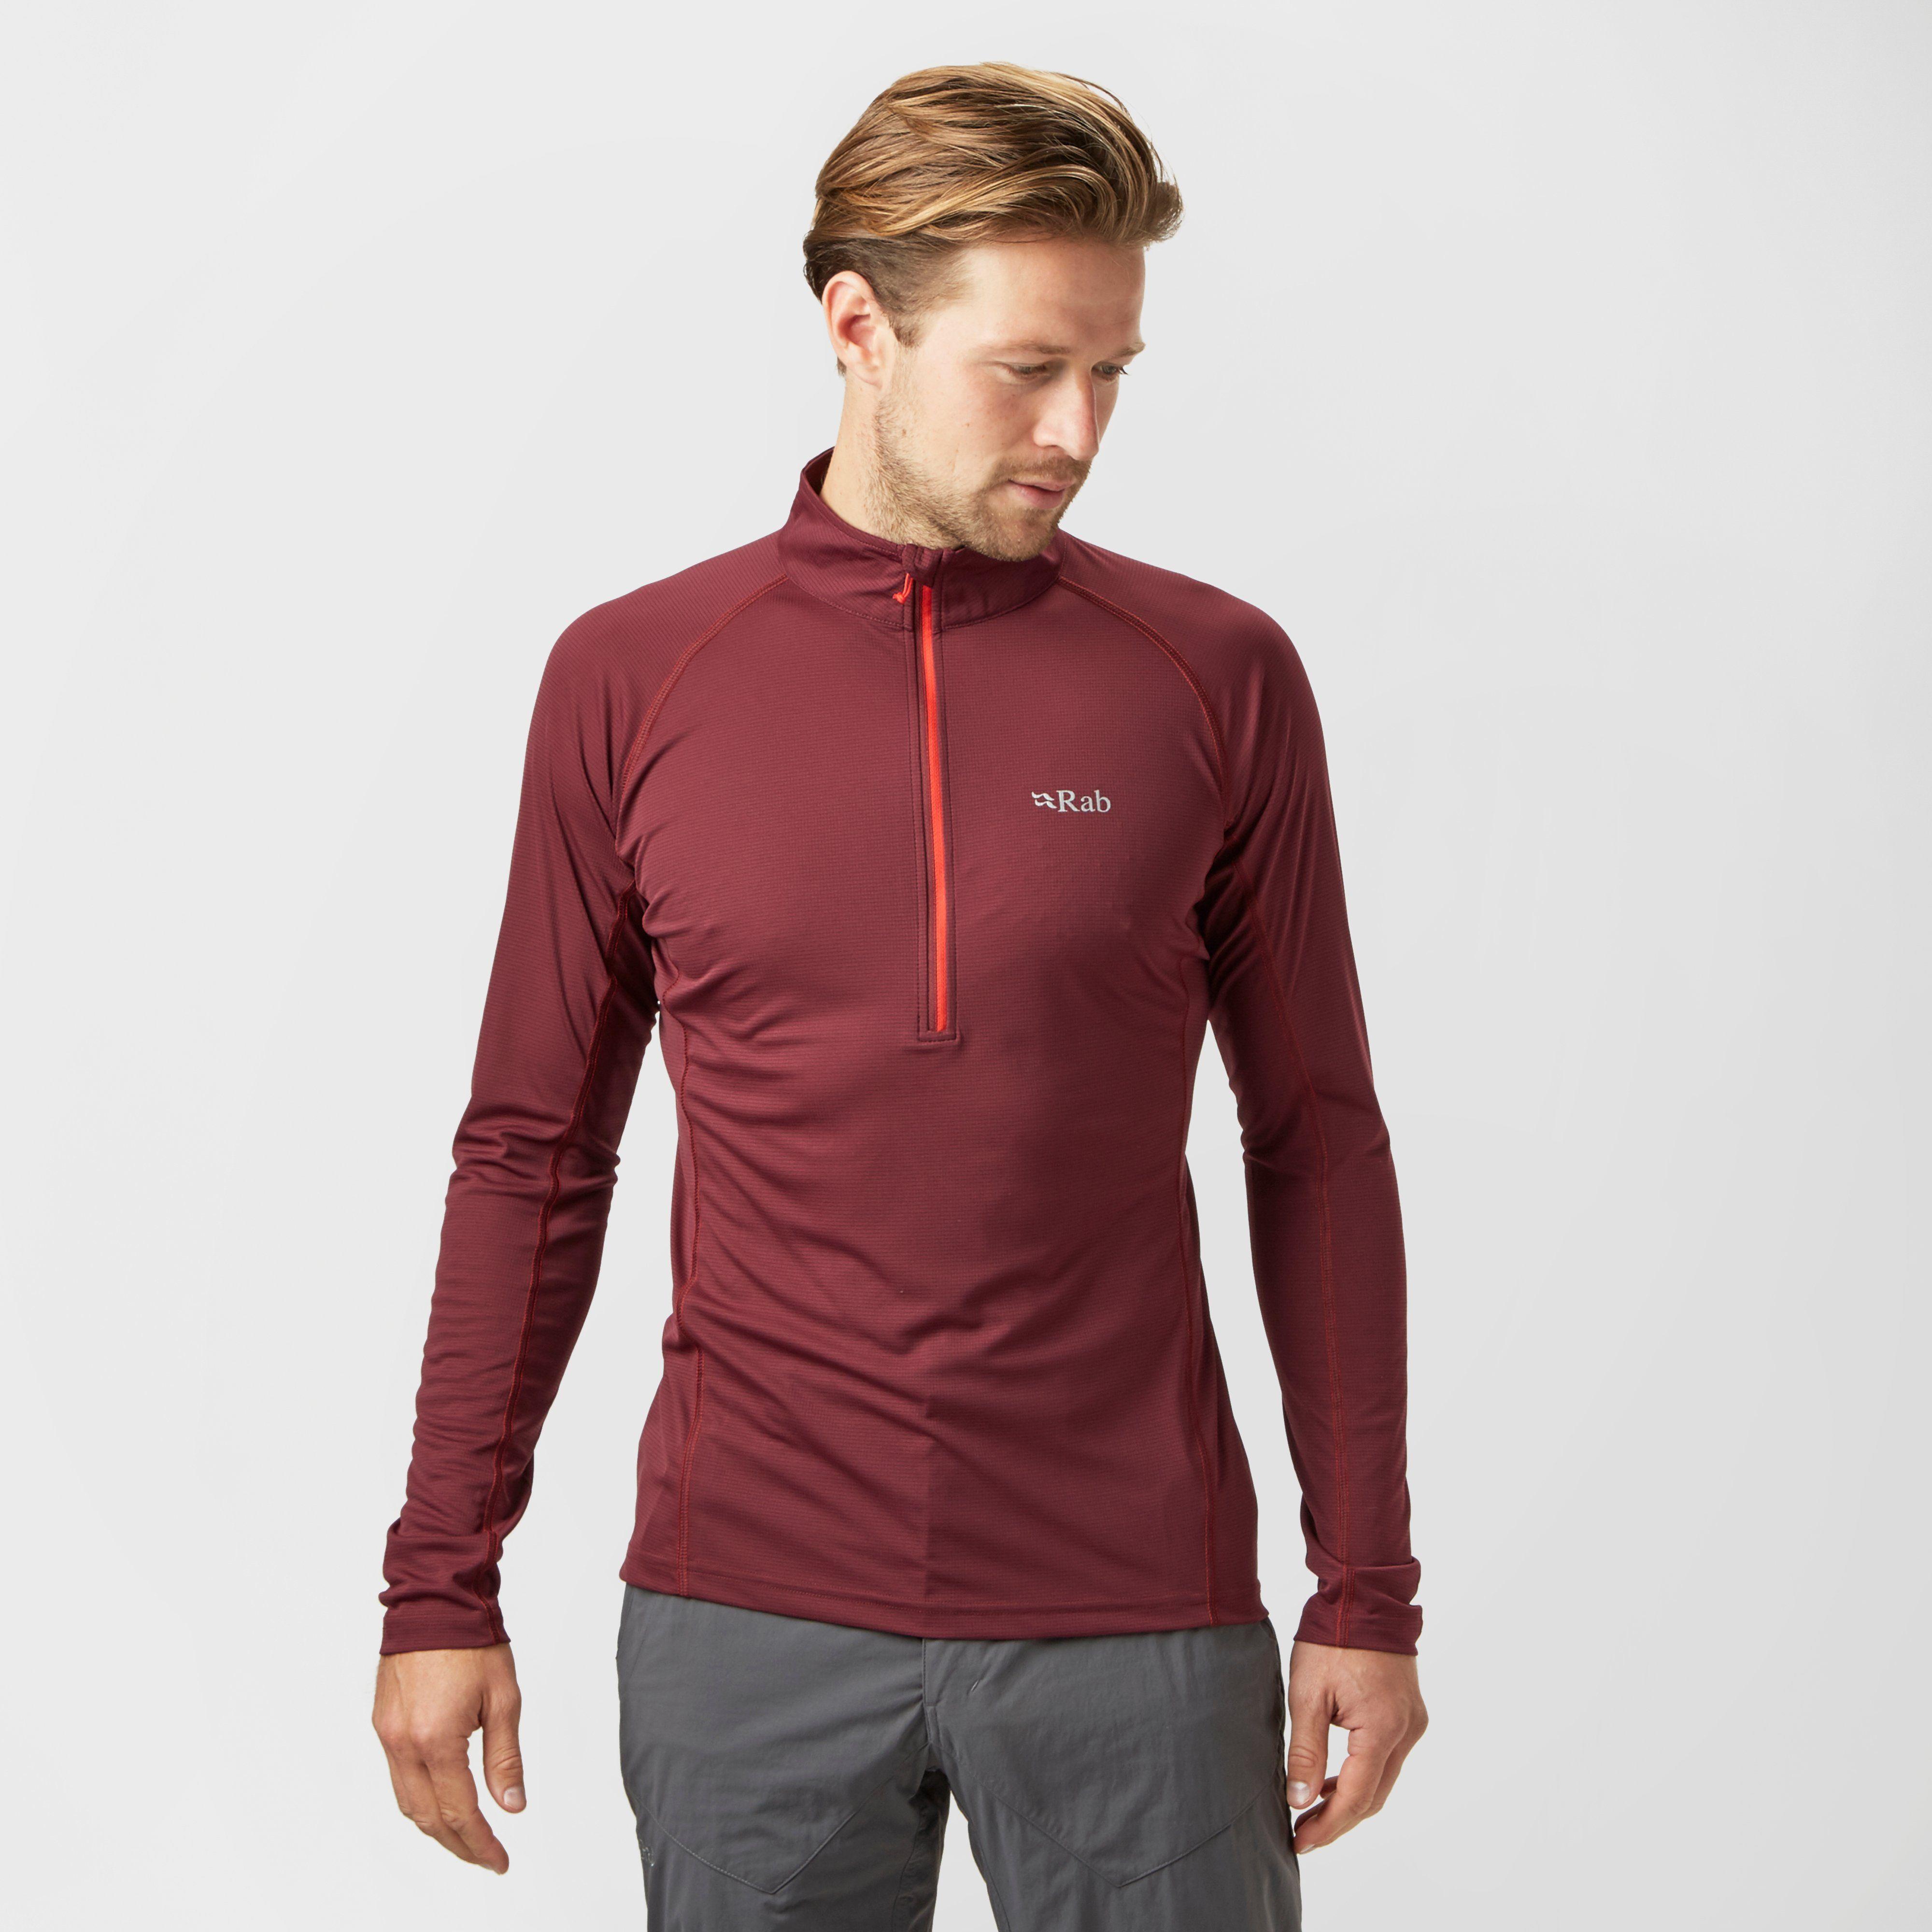 RAB Men'sInterval Long Sleeve Zip T-Shirt